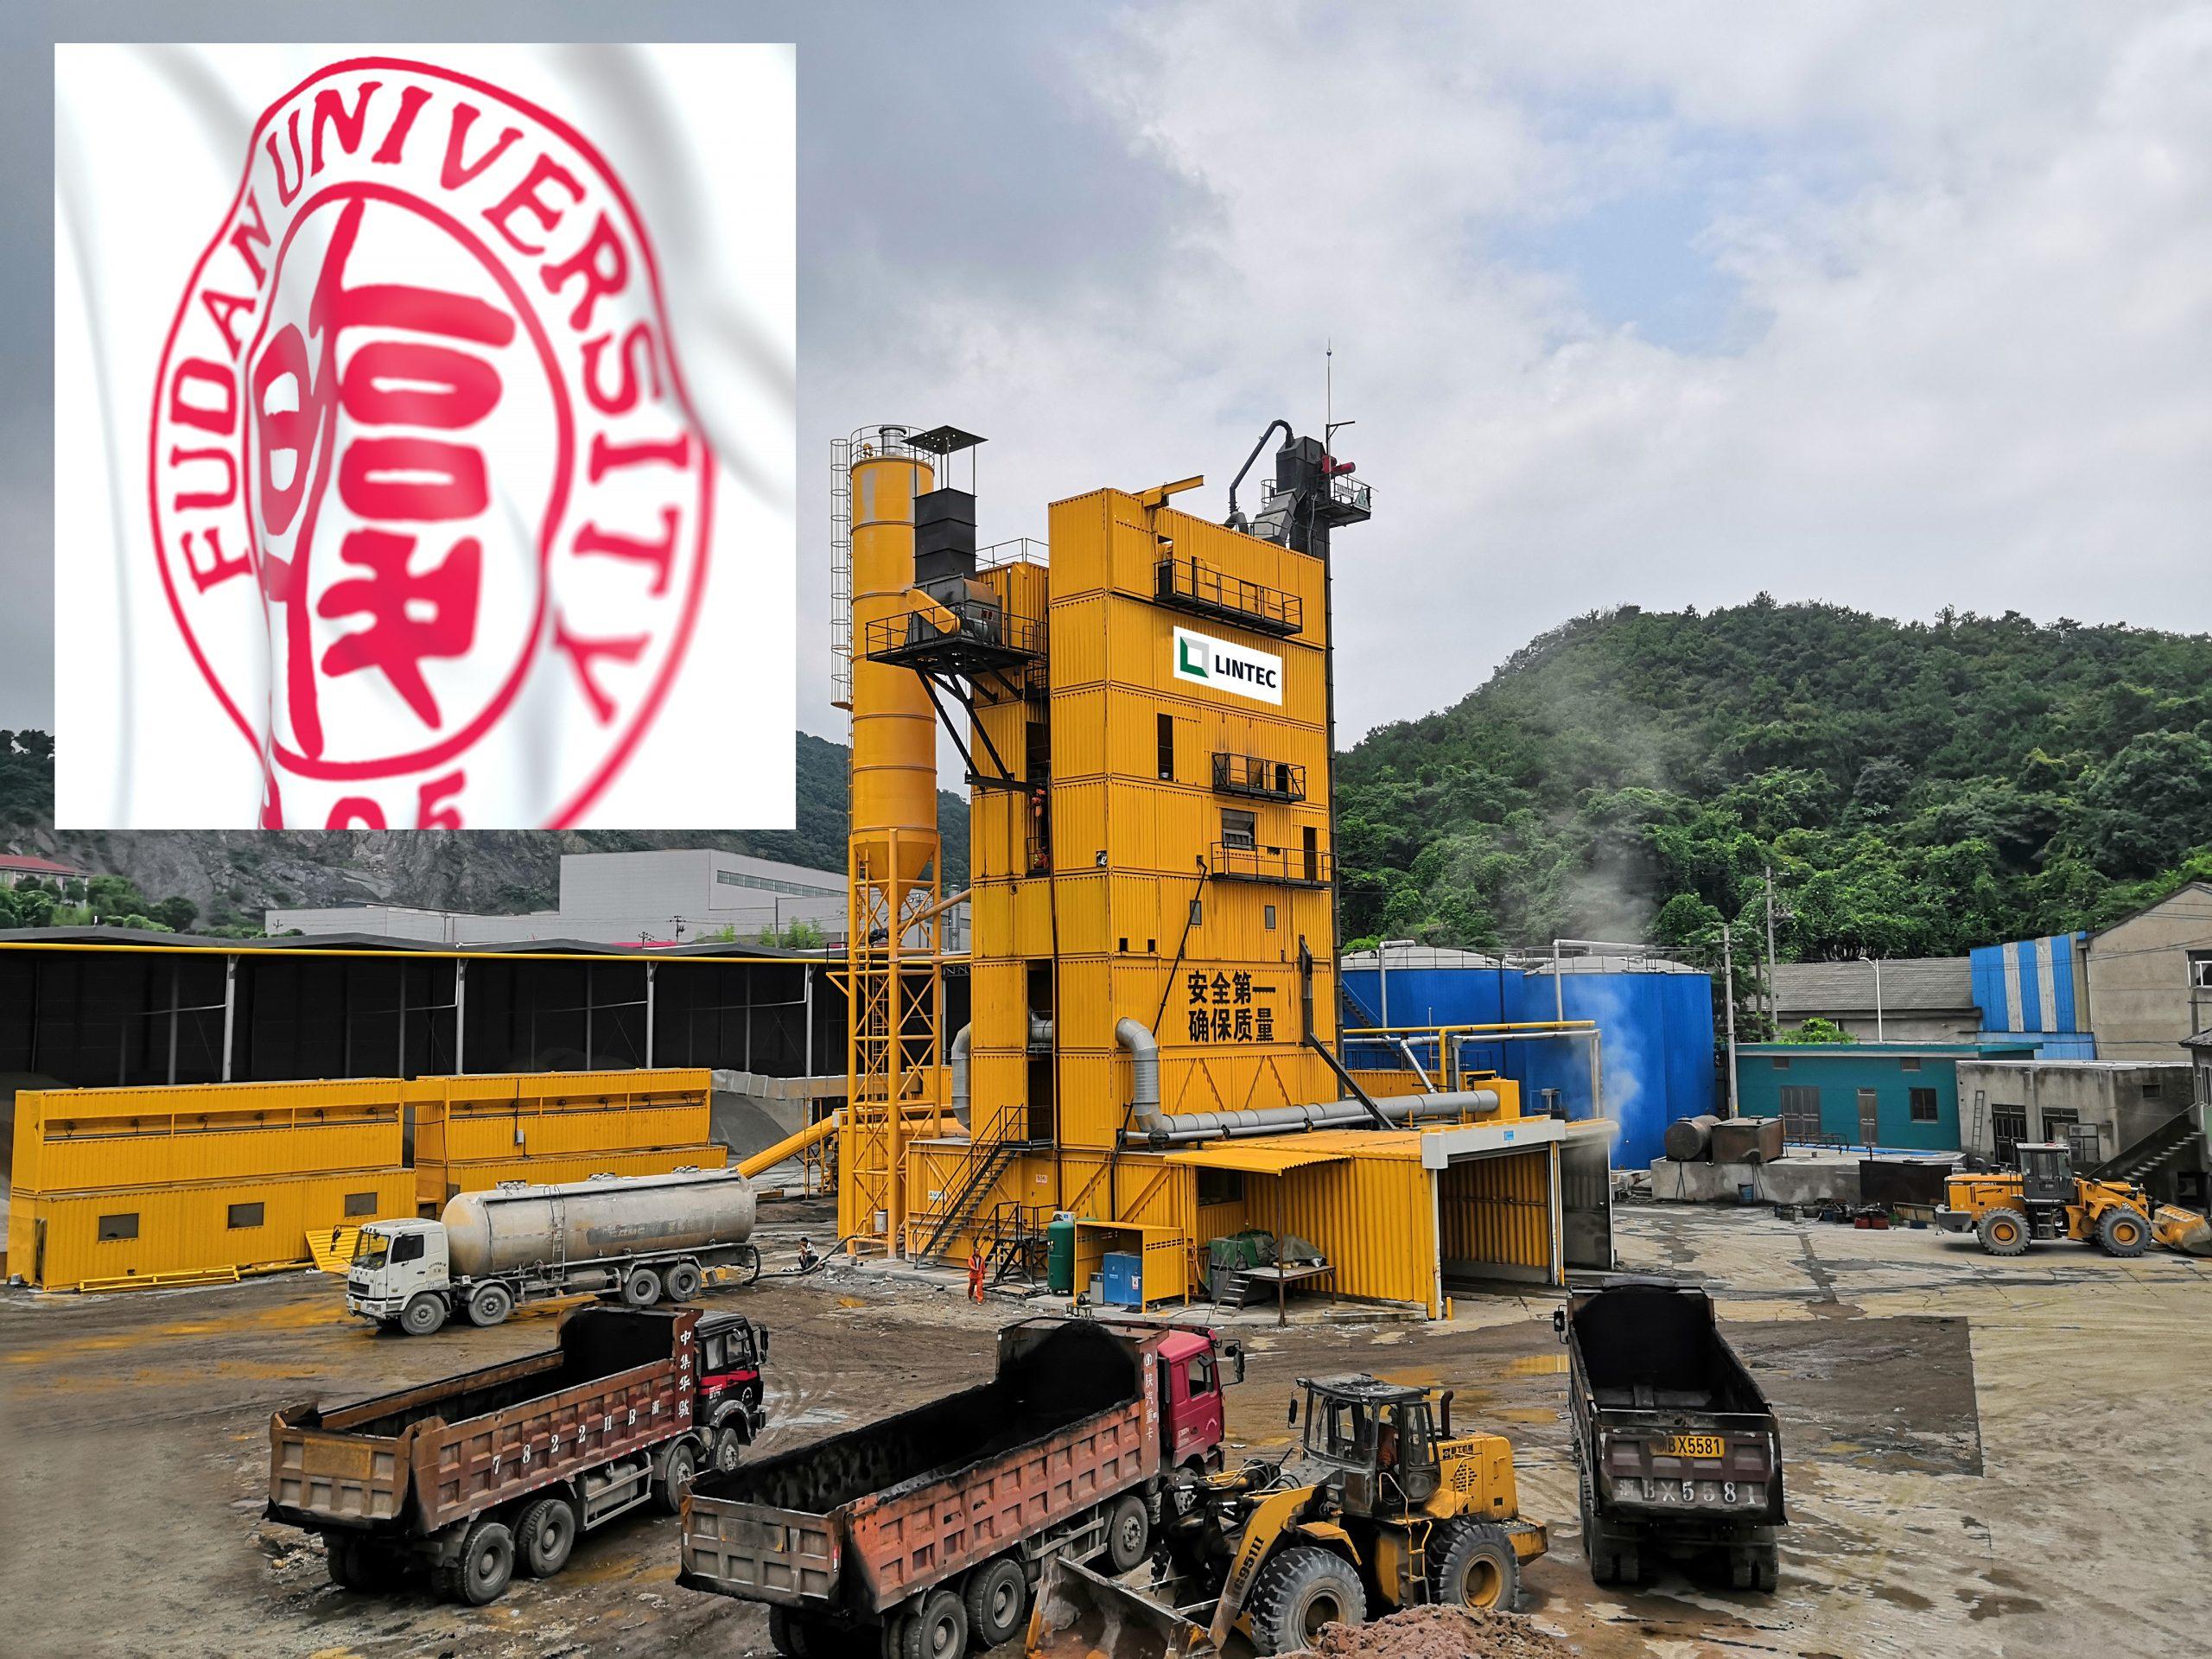 Lintec partners with Fudan University to make its asphalt plants more environment-friendly